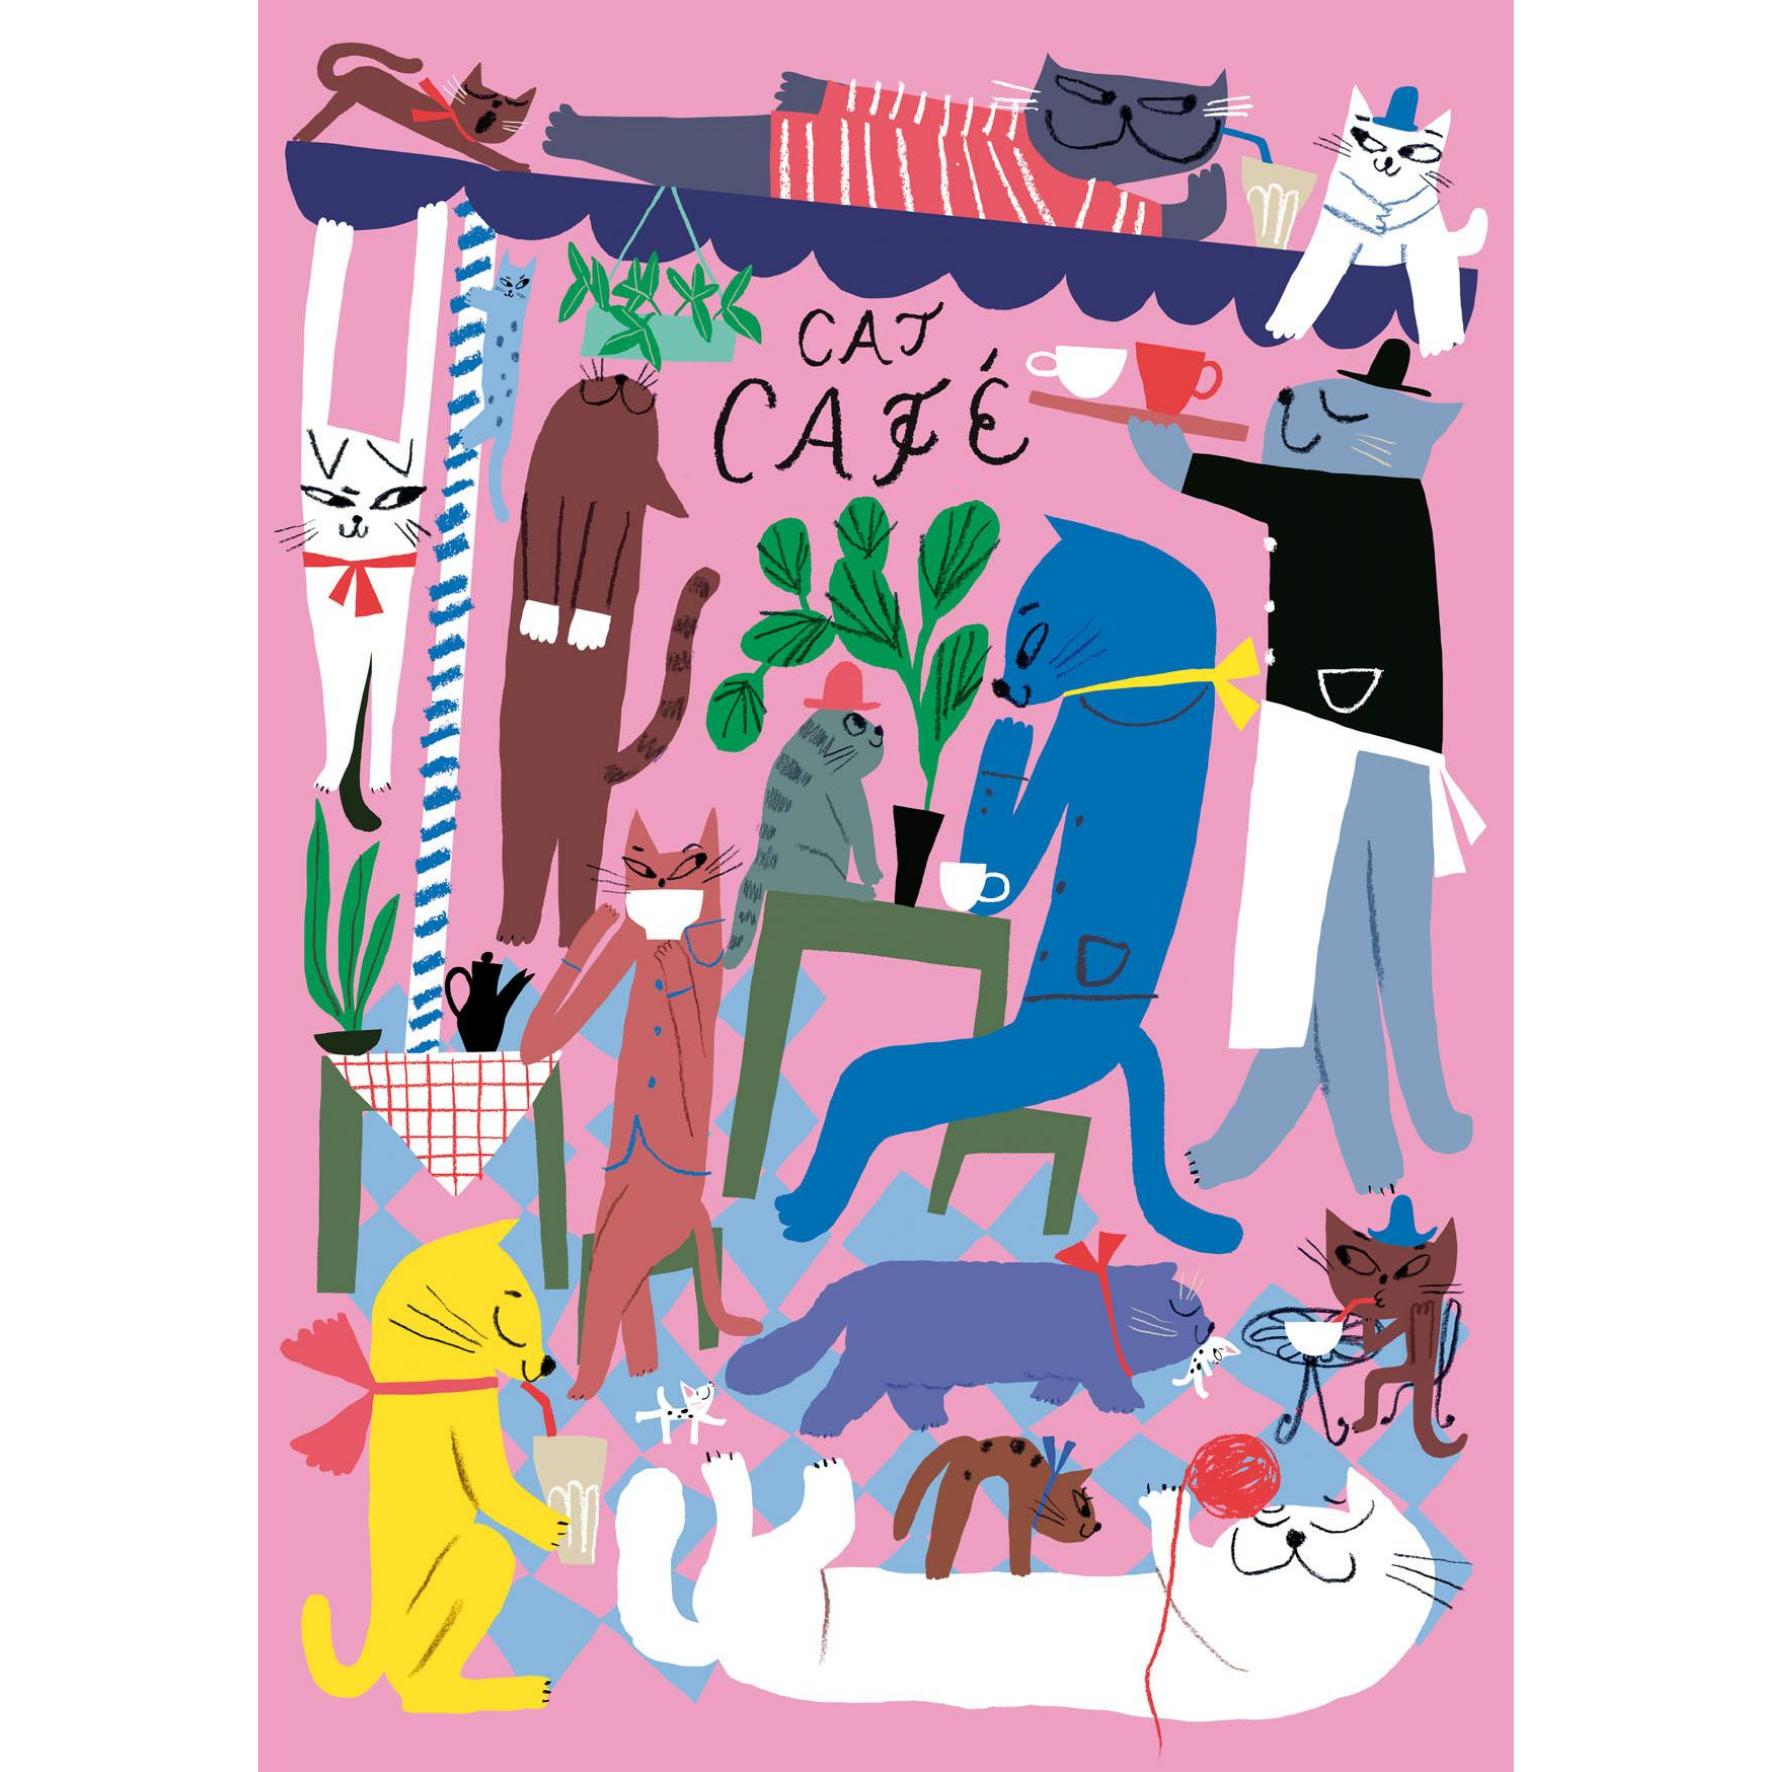 Cat cafe postikortti - Marika Maijala